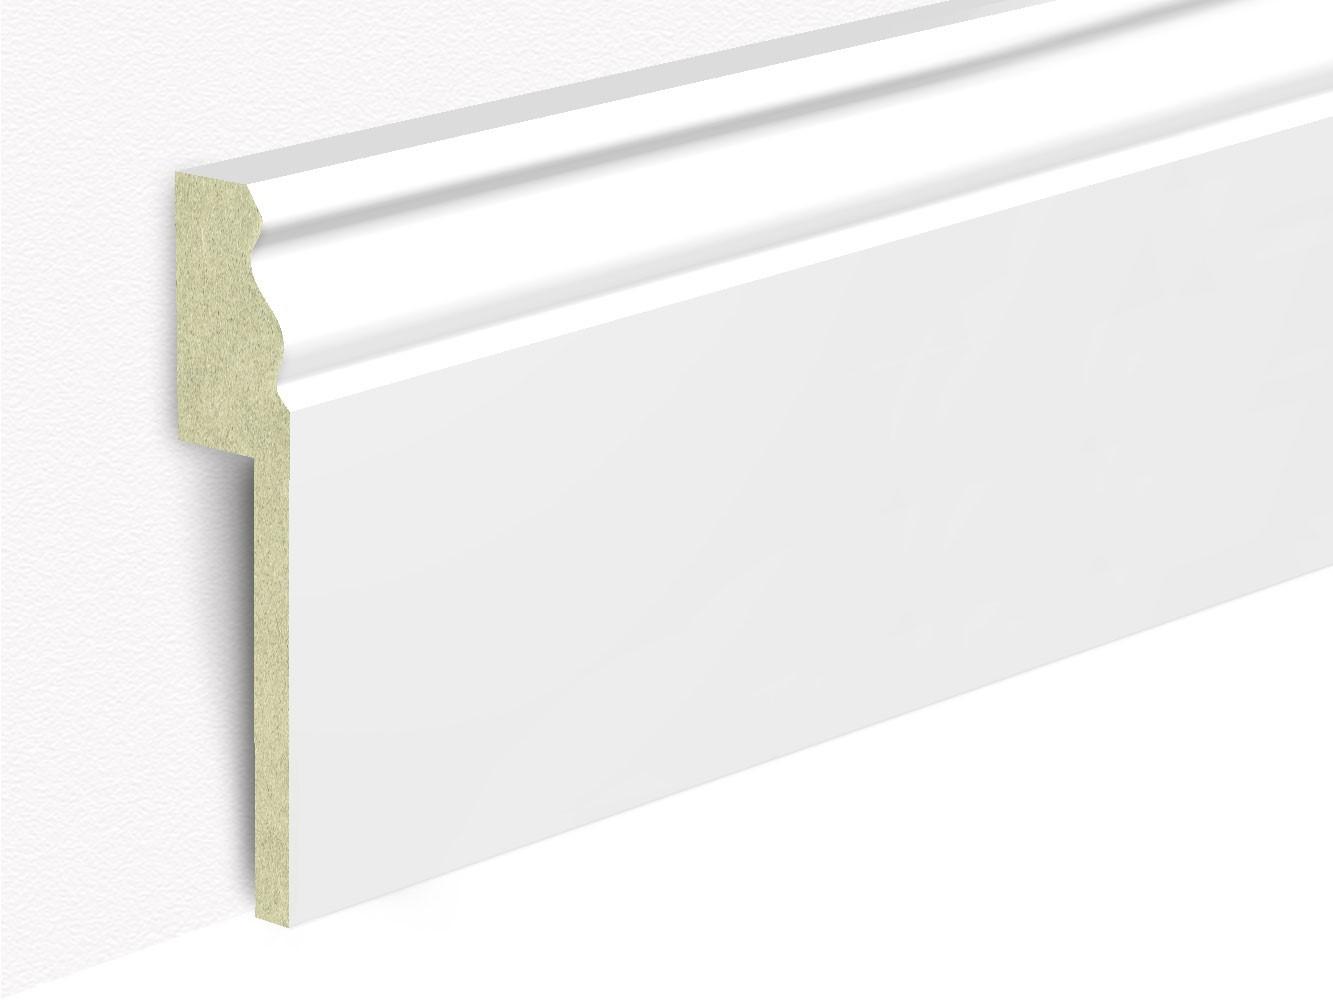 abdeckleiste f r fliesensockel hamburger profil feuchtraumgeeignet 19 x 100 x mm. Black Bedroom Furniture Sets. Home Design Ideas